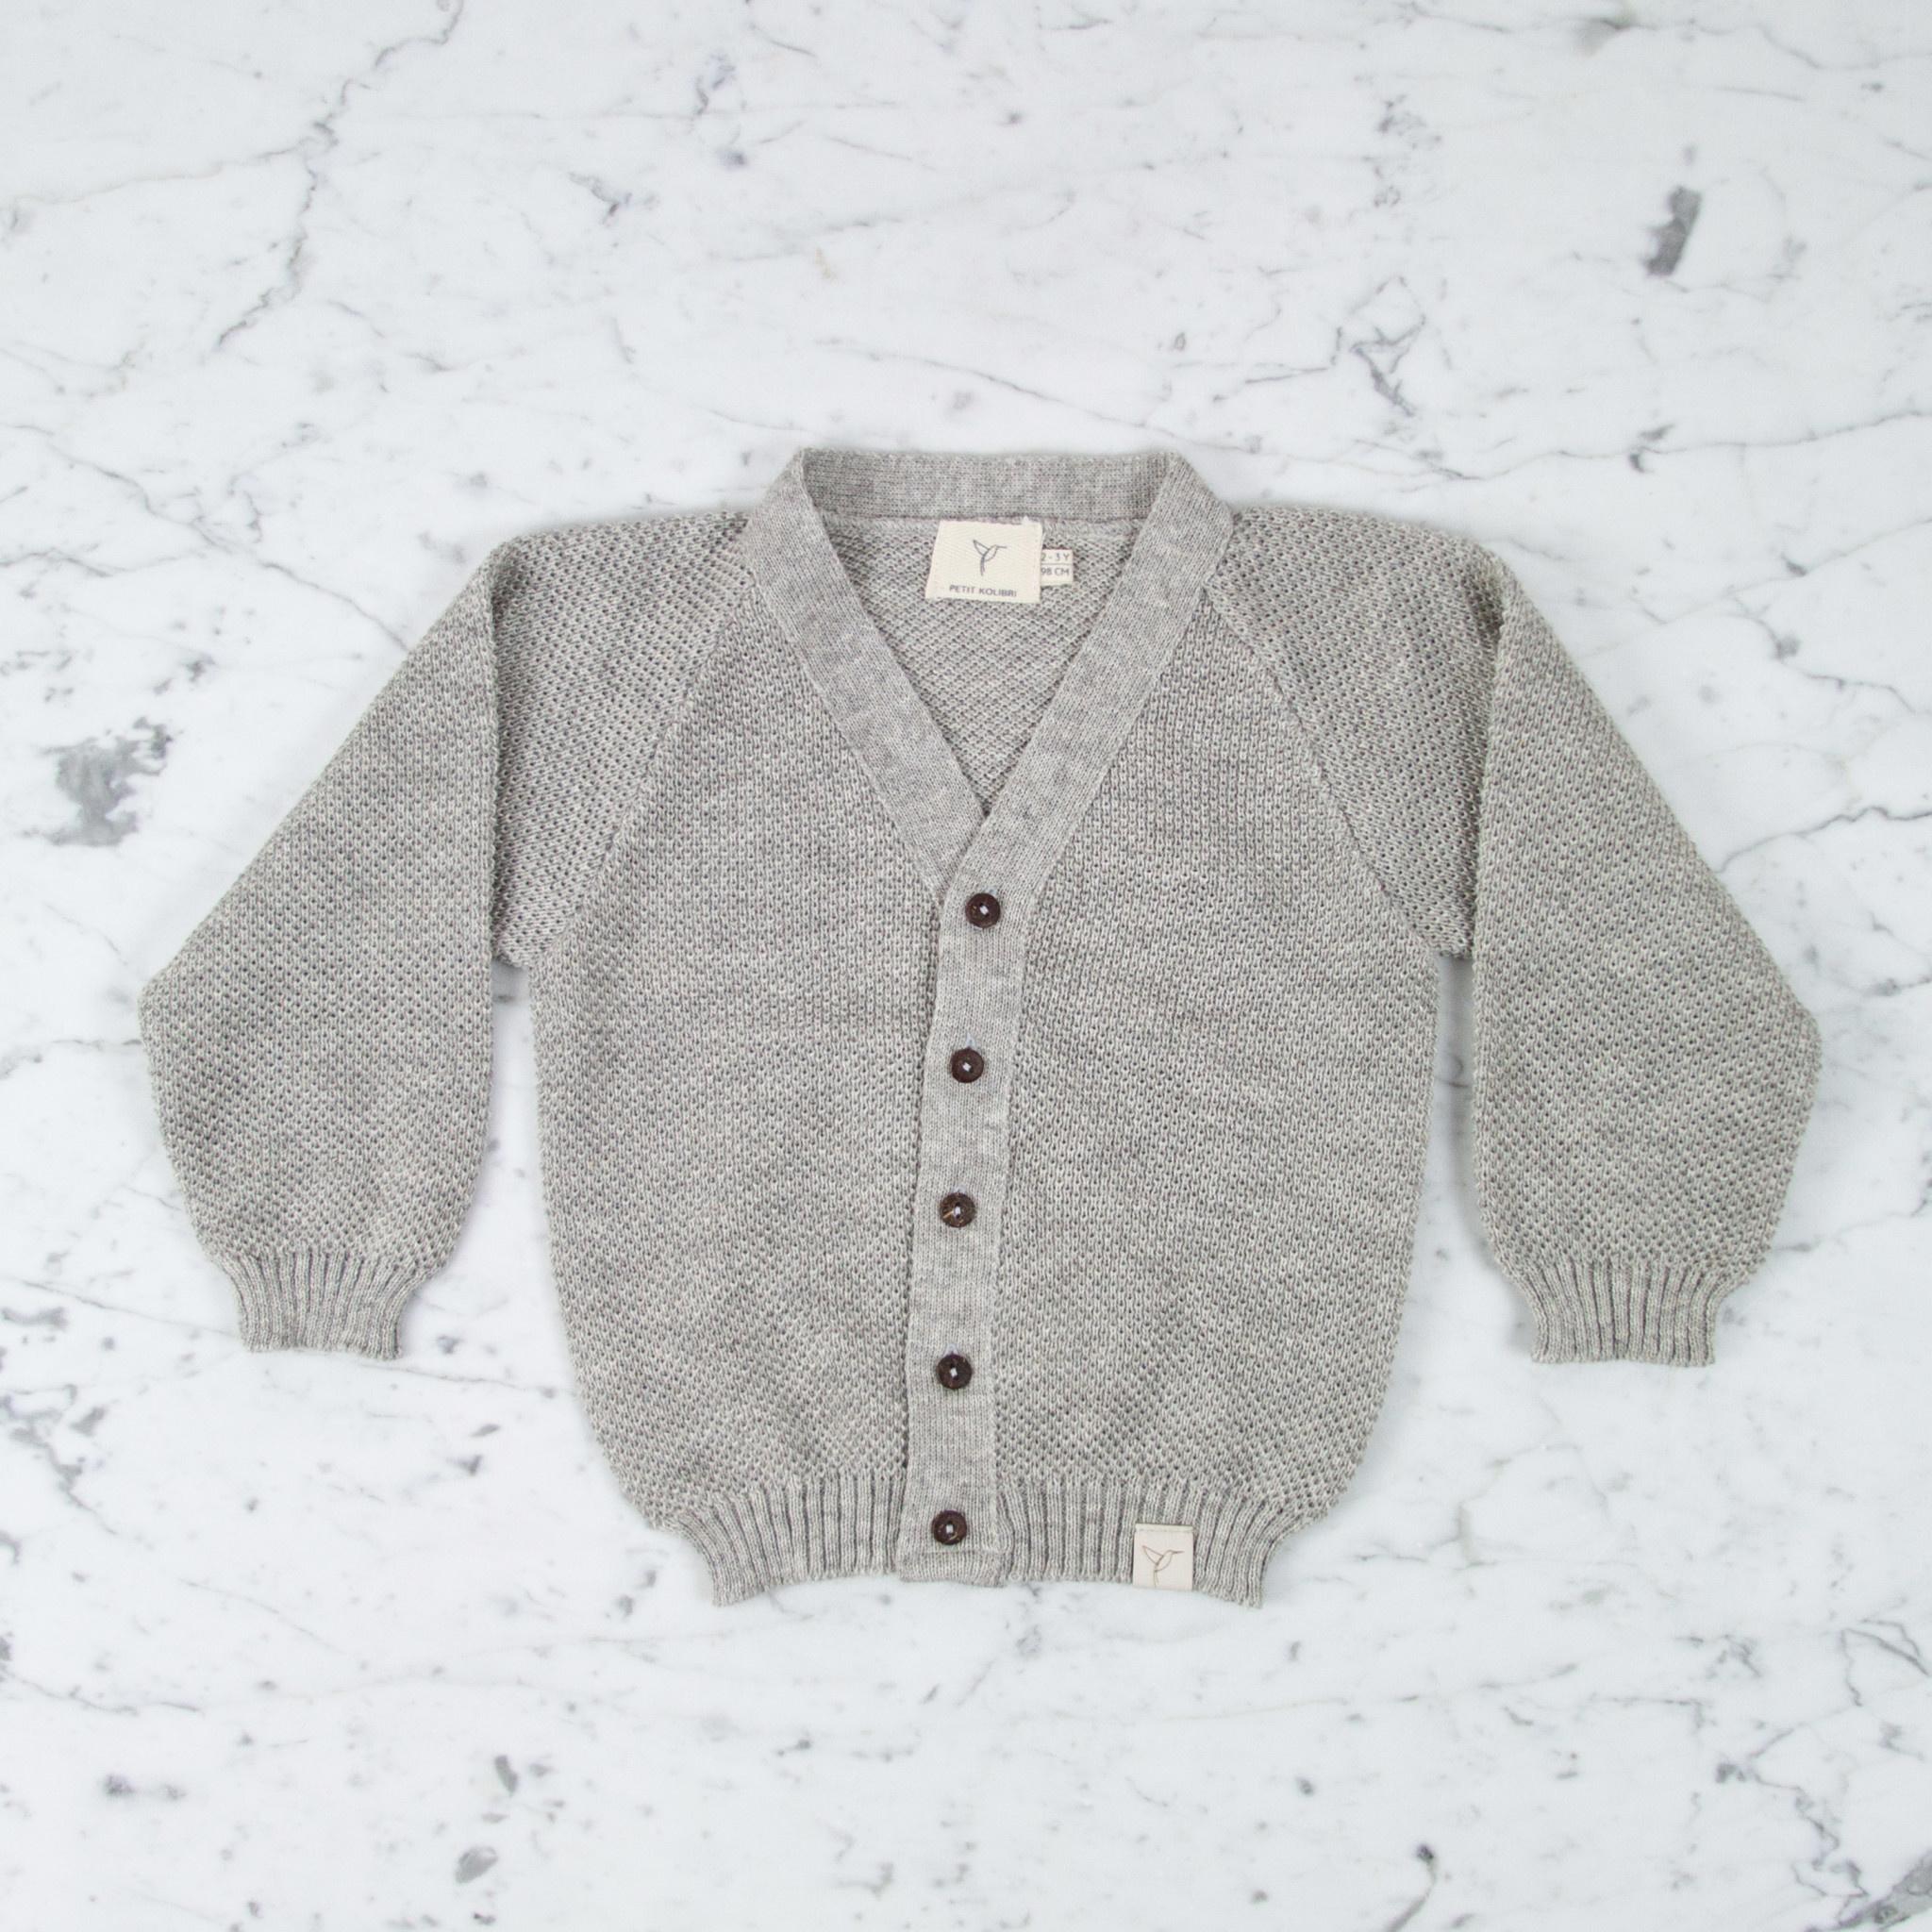 Petit Kolibri Alpaca + Cotton Knit Cardigan - Grey - 2-3 Year